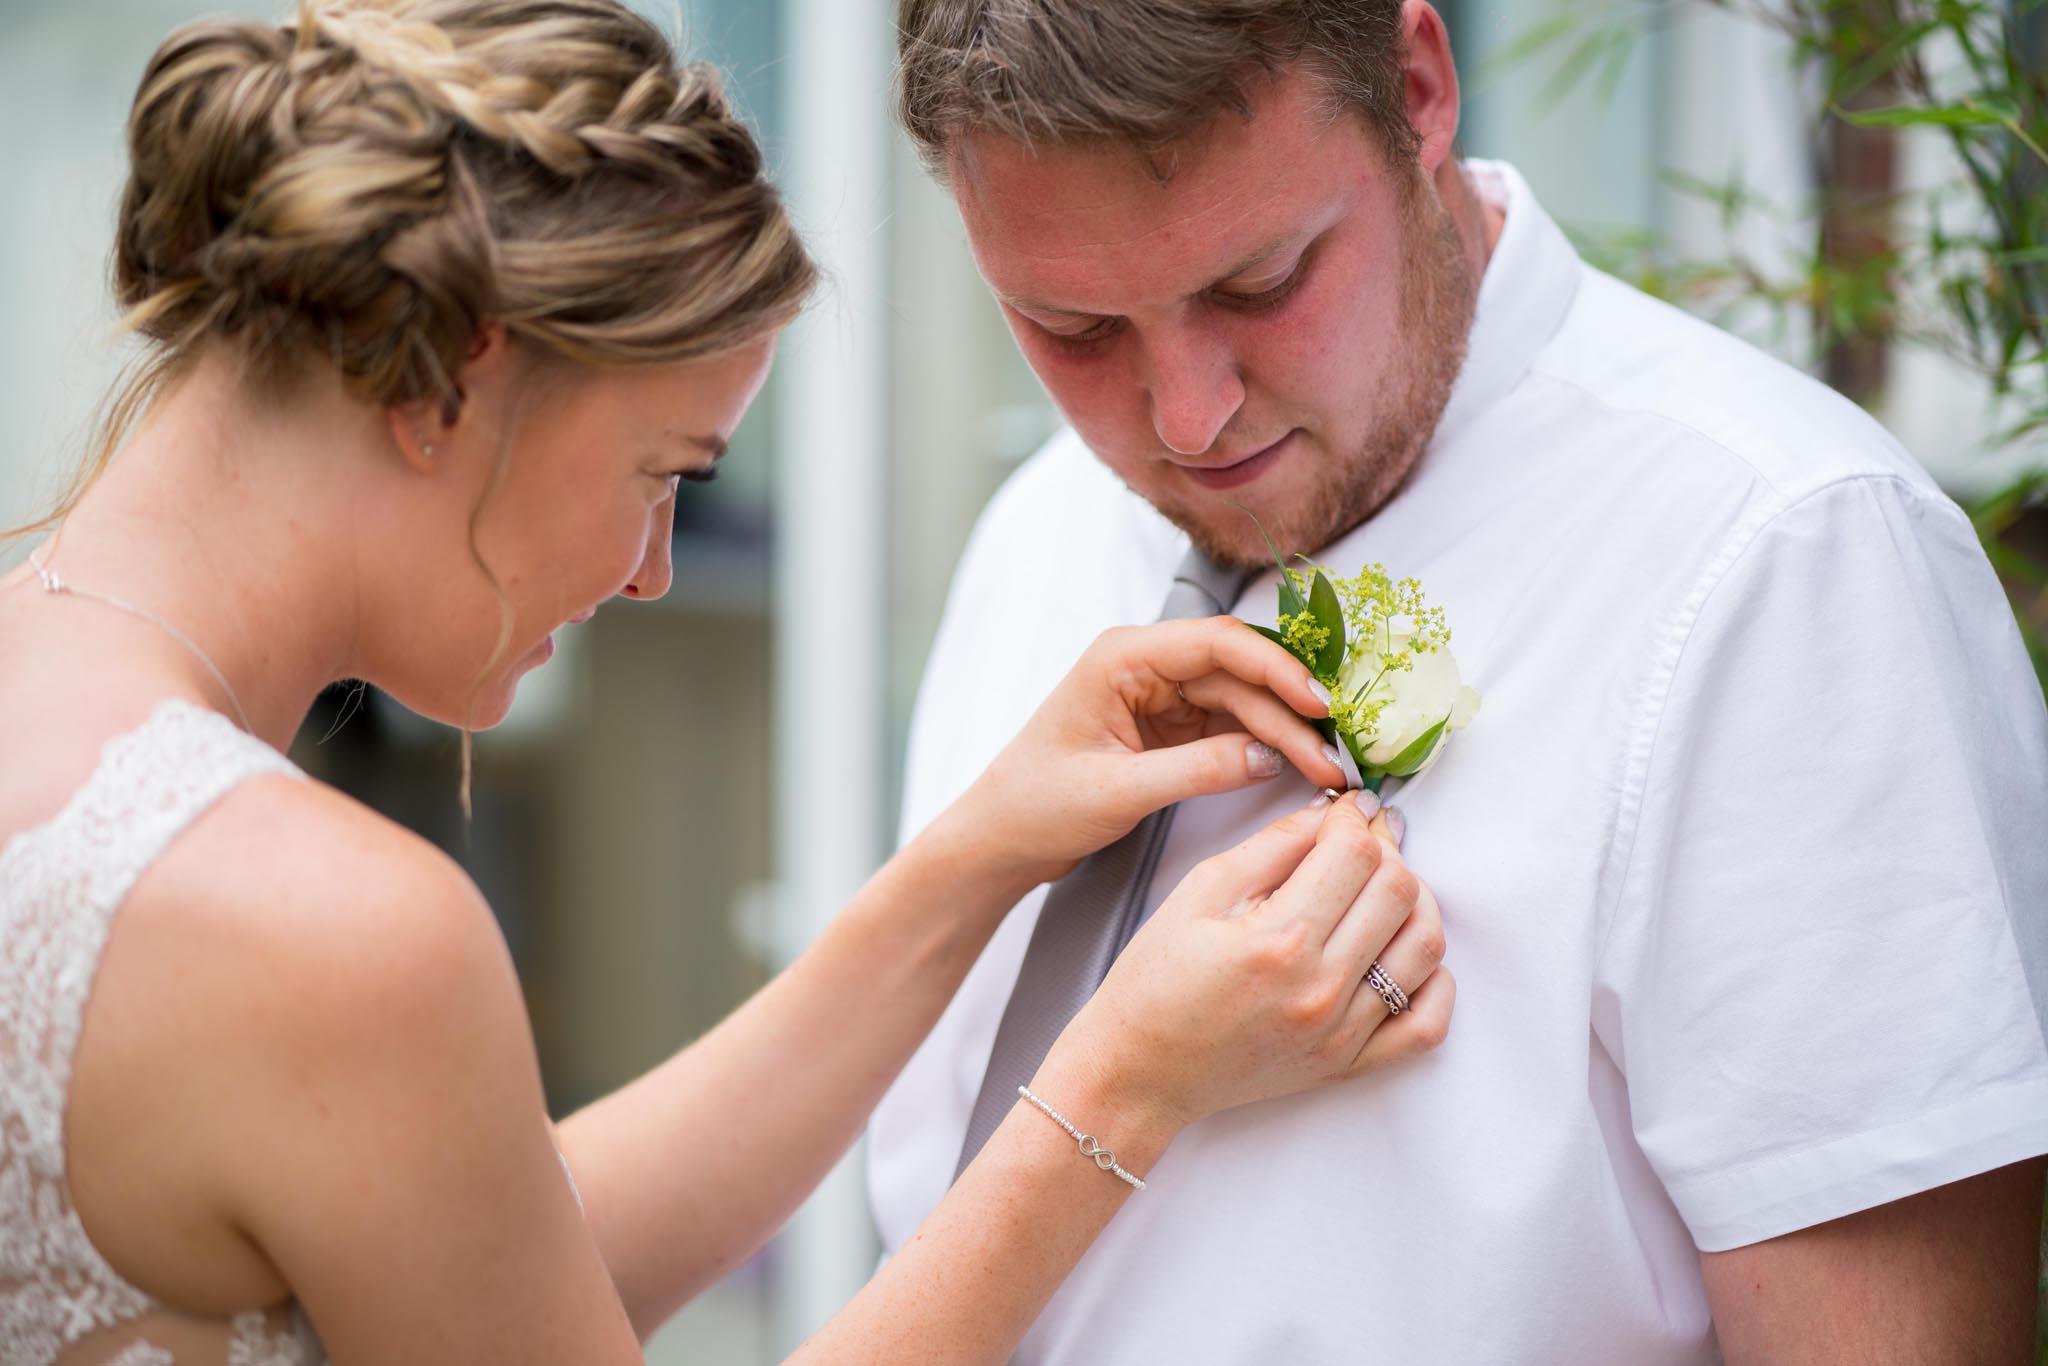 132-Preparations-Luke-Yasmin-The-Rayleigh-Club-Wedding-Photography.jpg